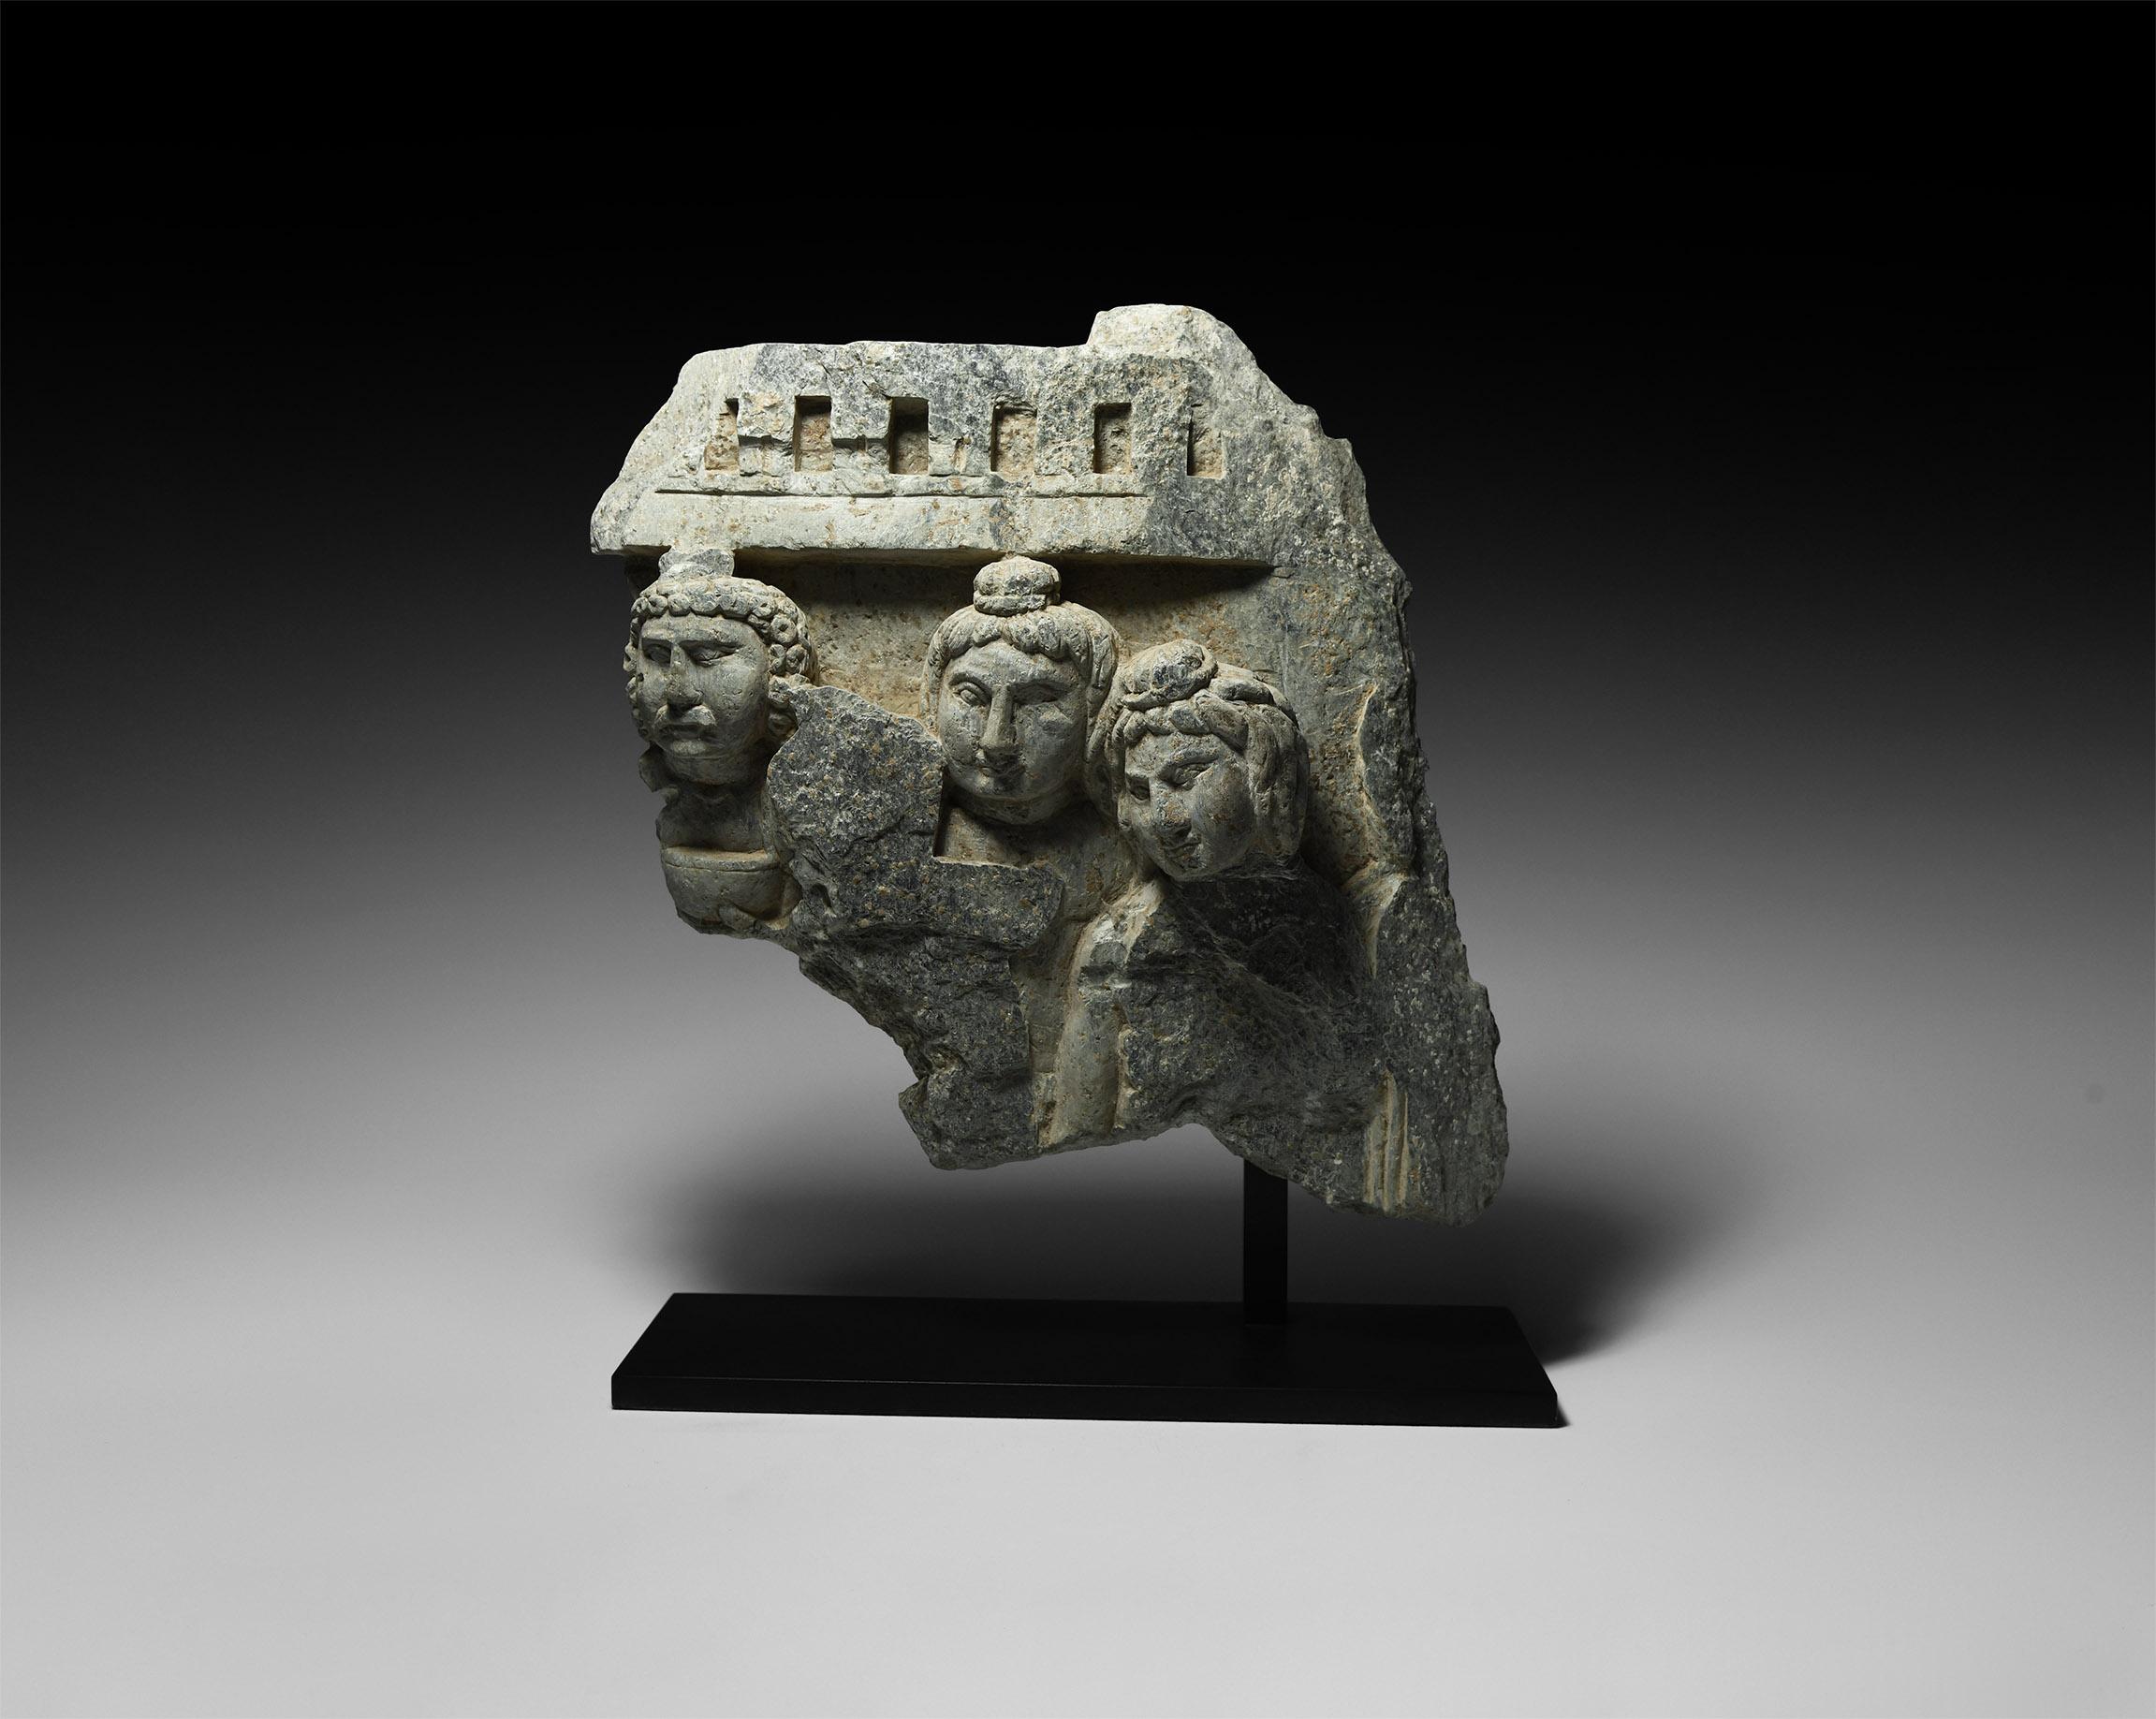 Gandharan Frieze Section with Bodhisattvas